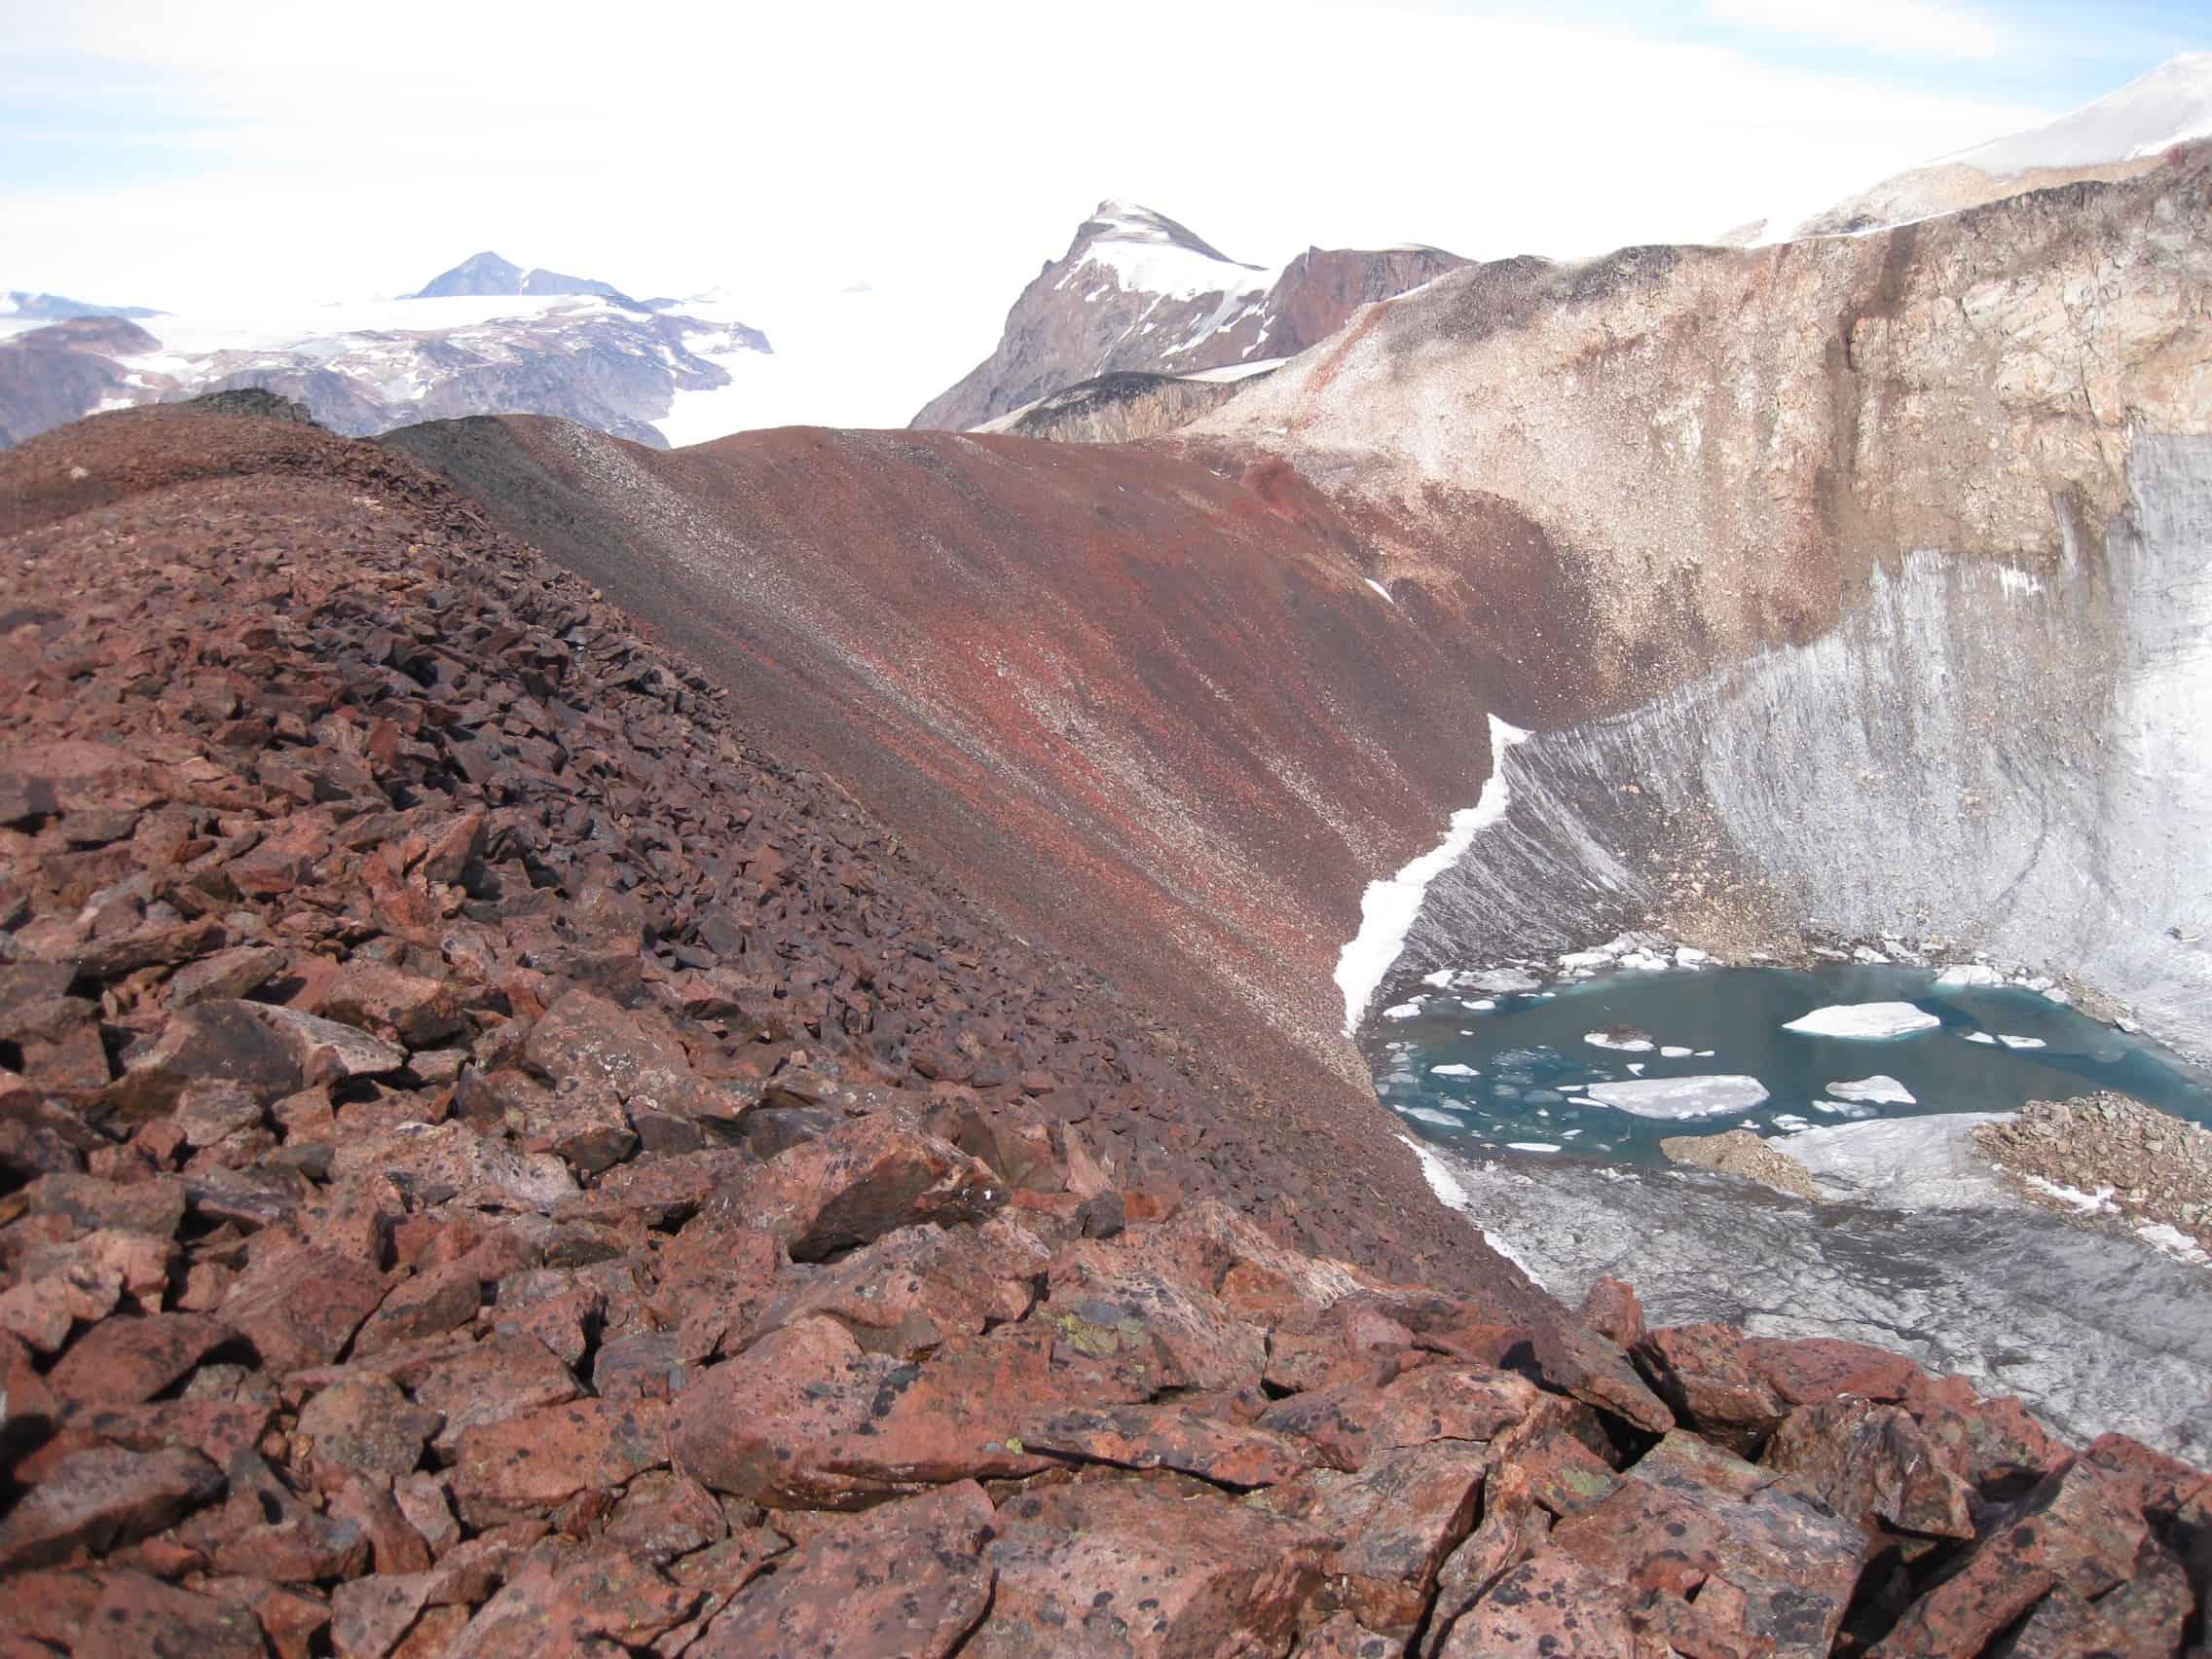 Volcanic deposits